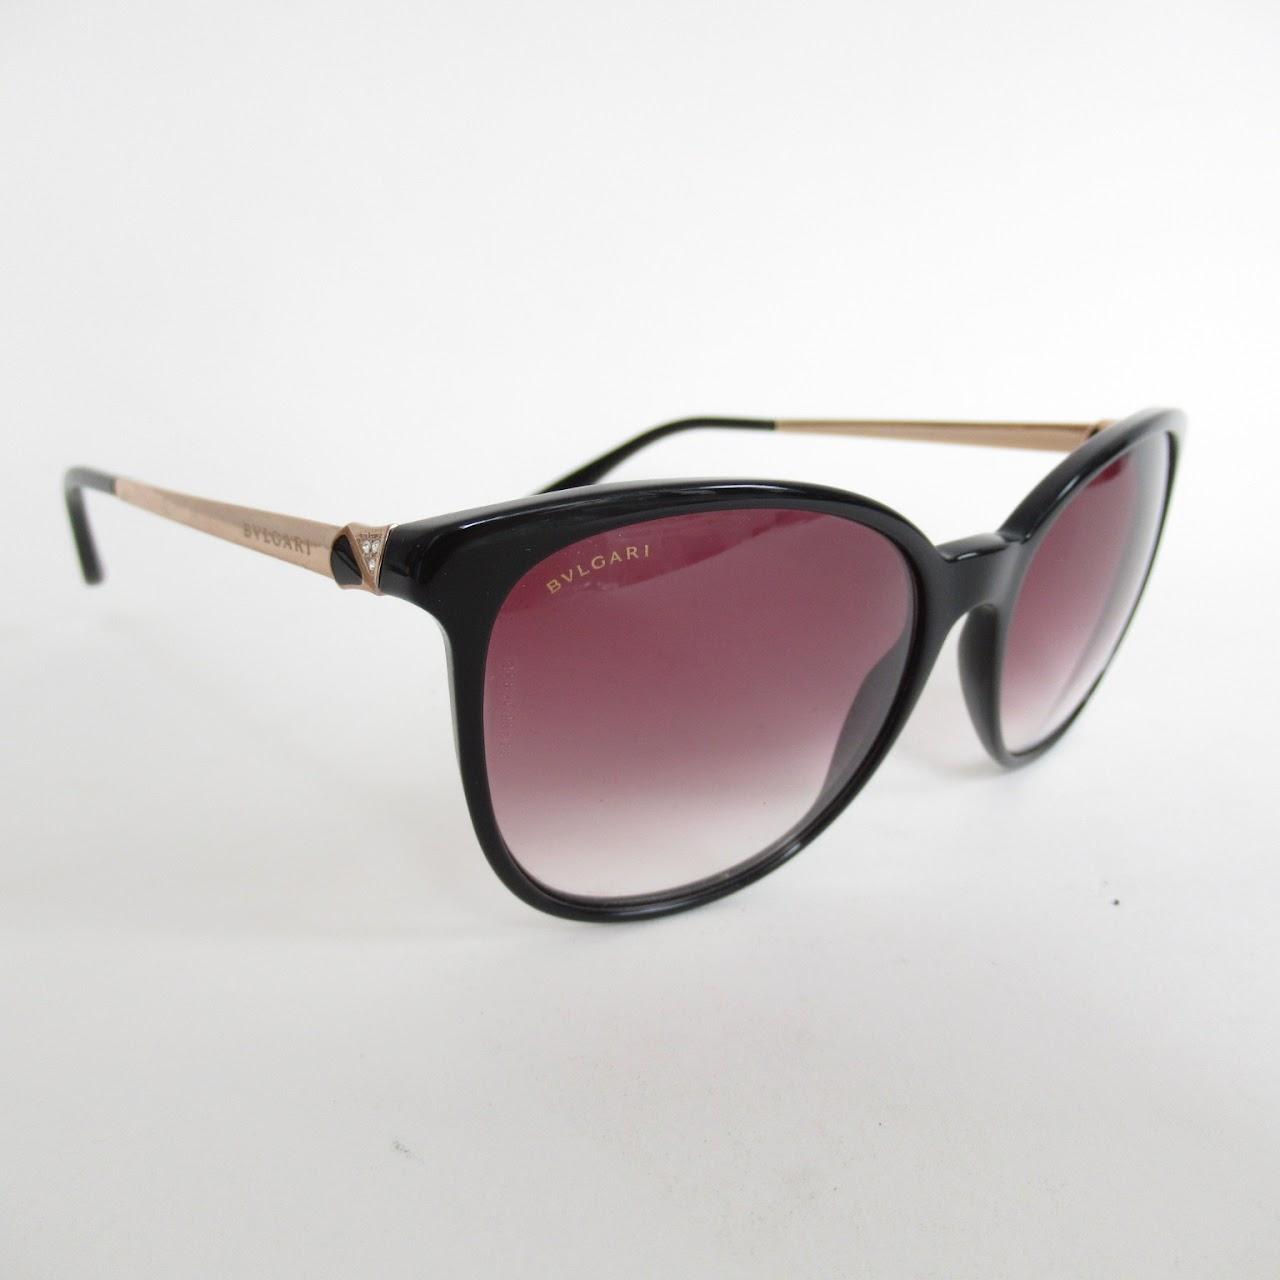 69b3ae21bb1d Bvlgari Sunglasses | Shophousingworks